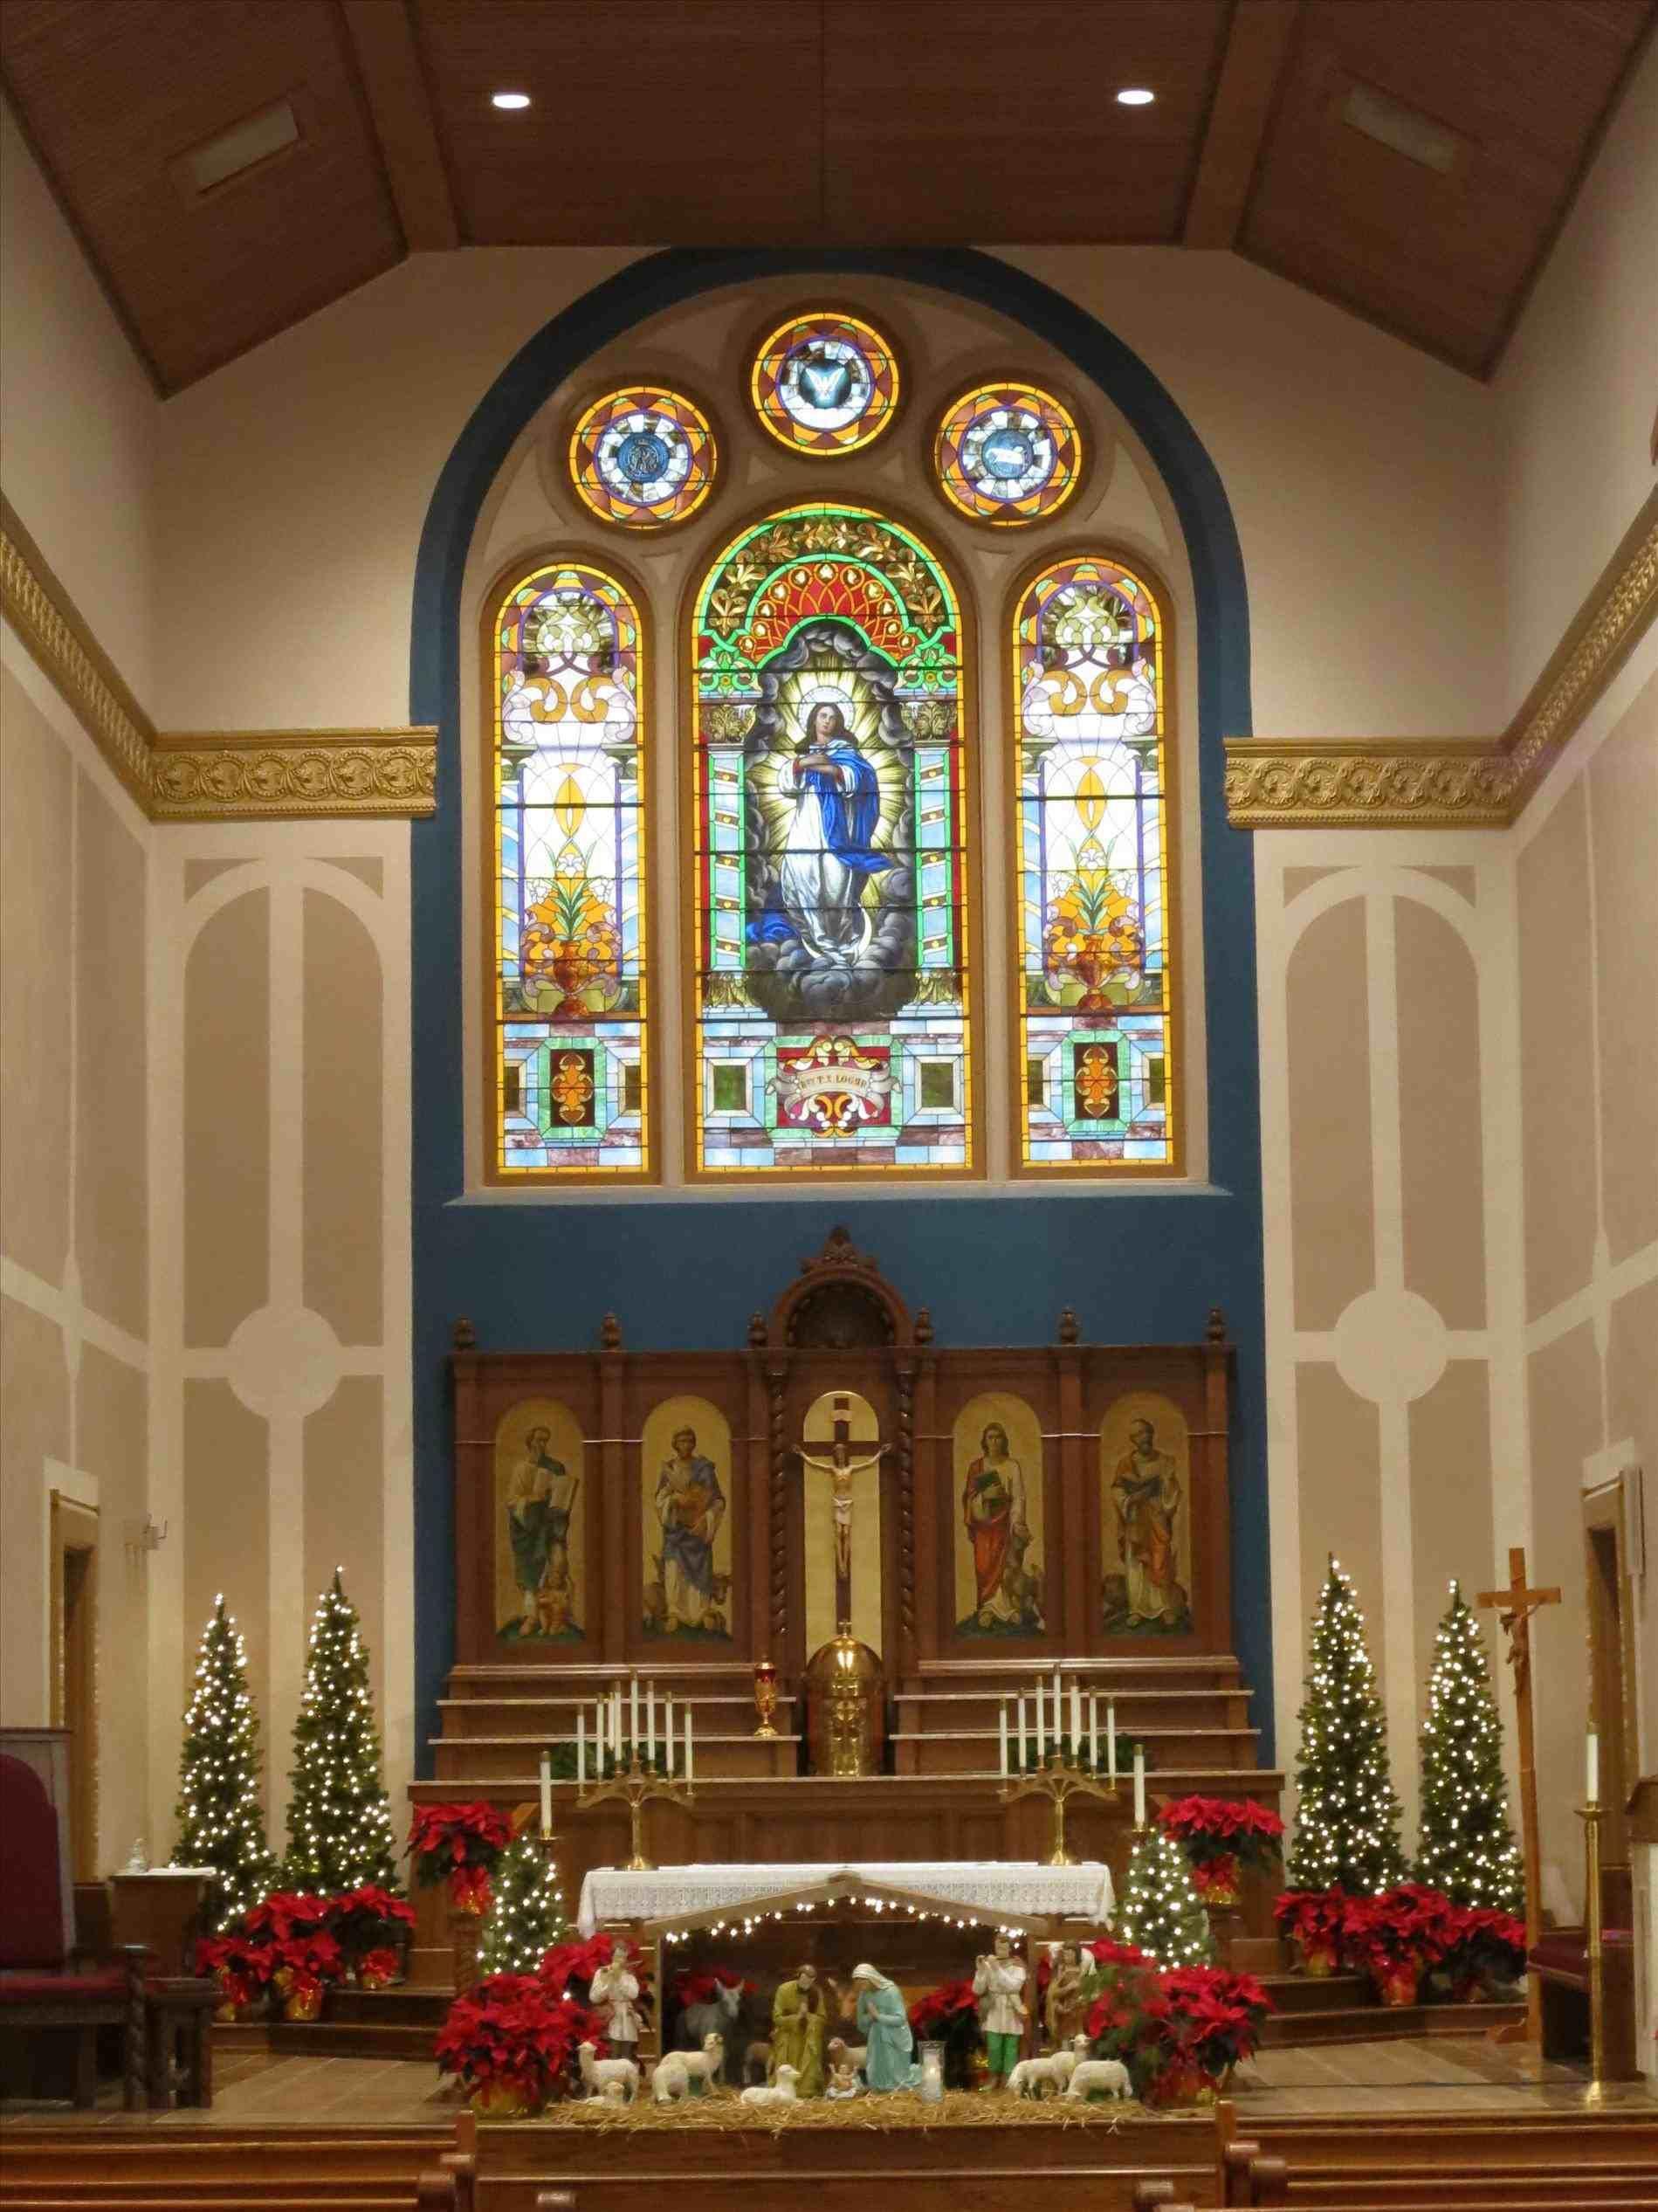 25 top view post christmas decorations for church sanctuary visit homelivings decor ideas - Christmas Decorating Ideas For Church Sanctuary